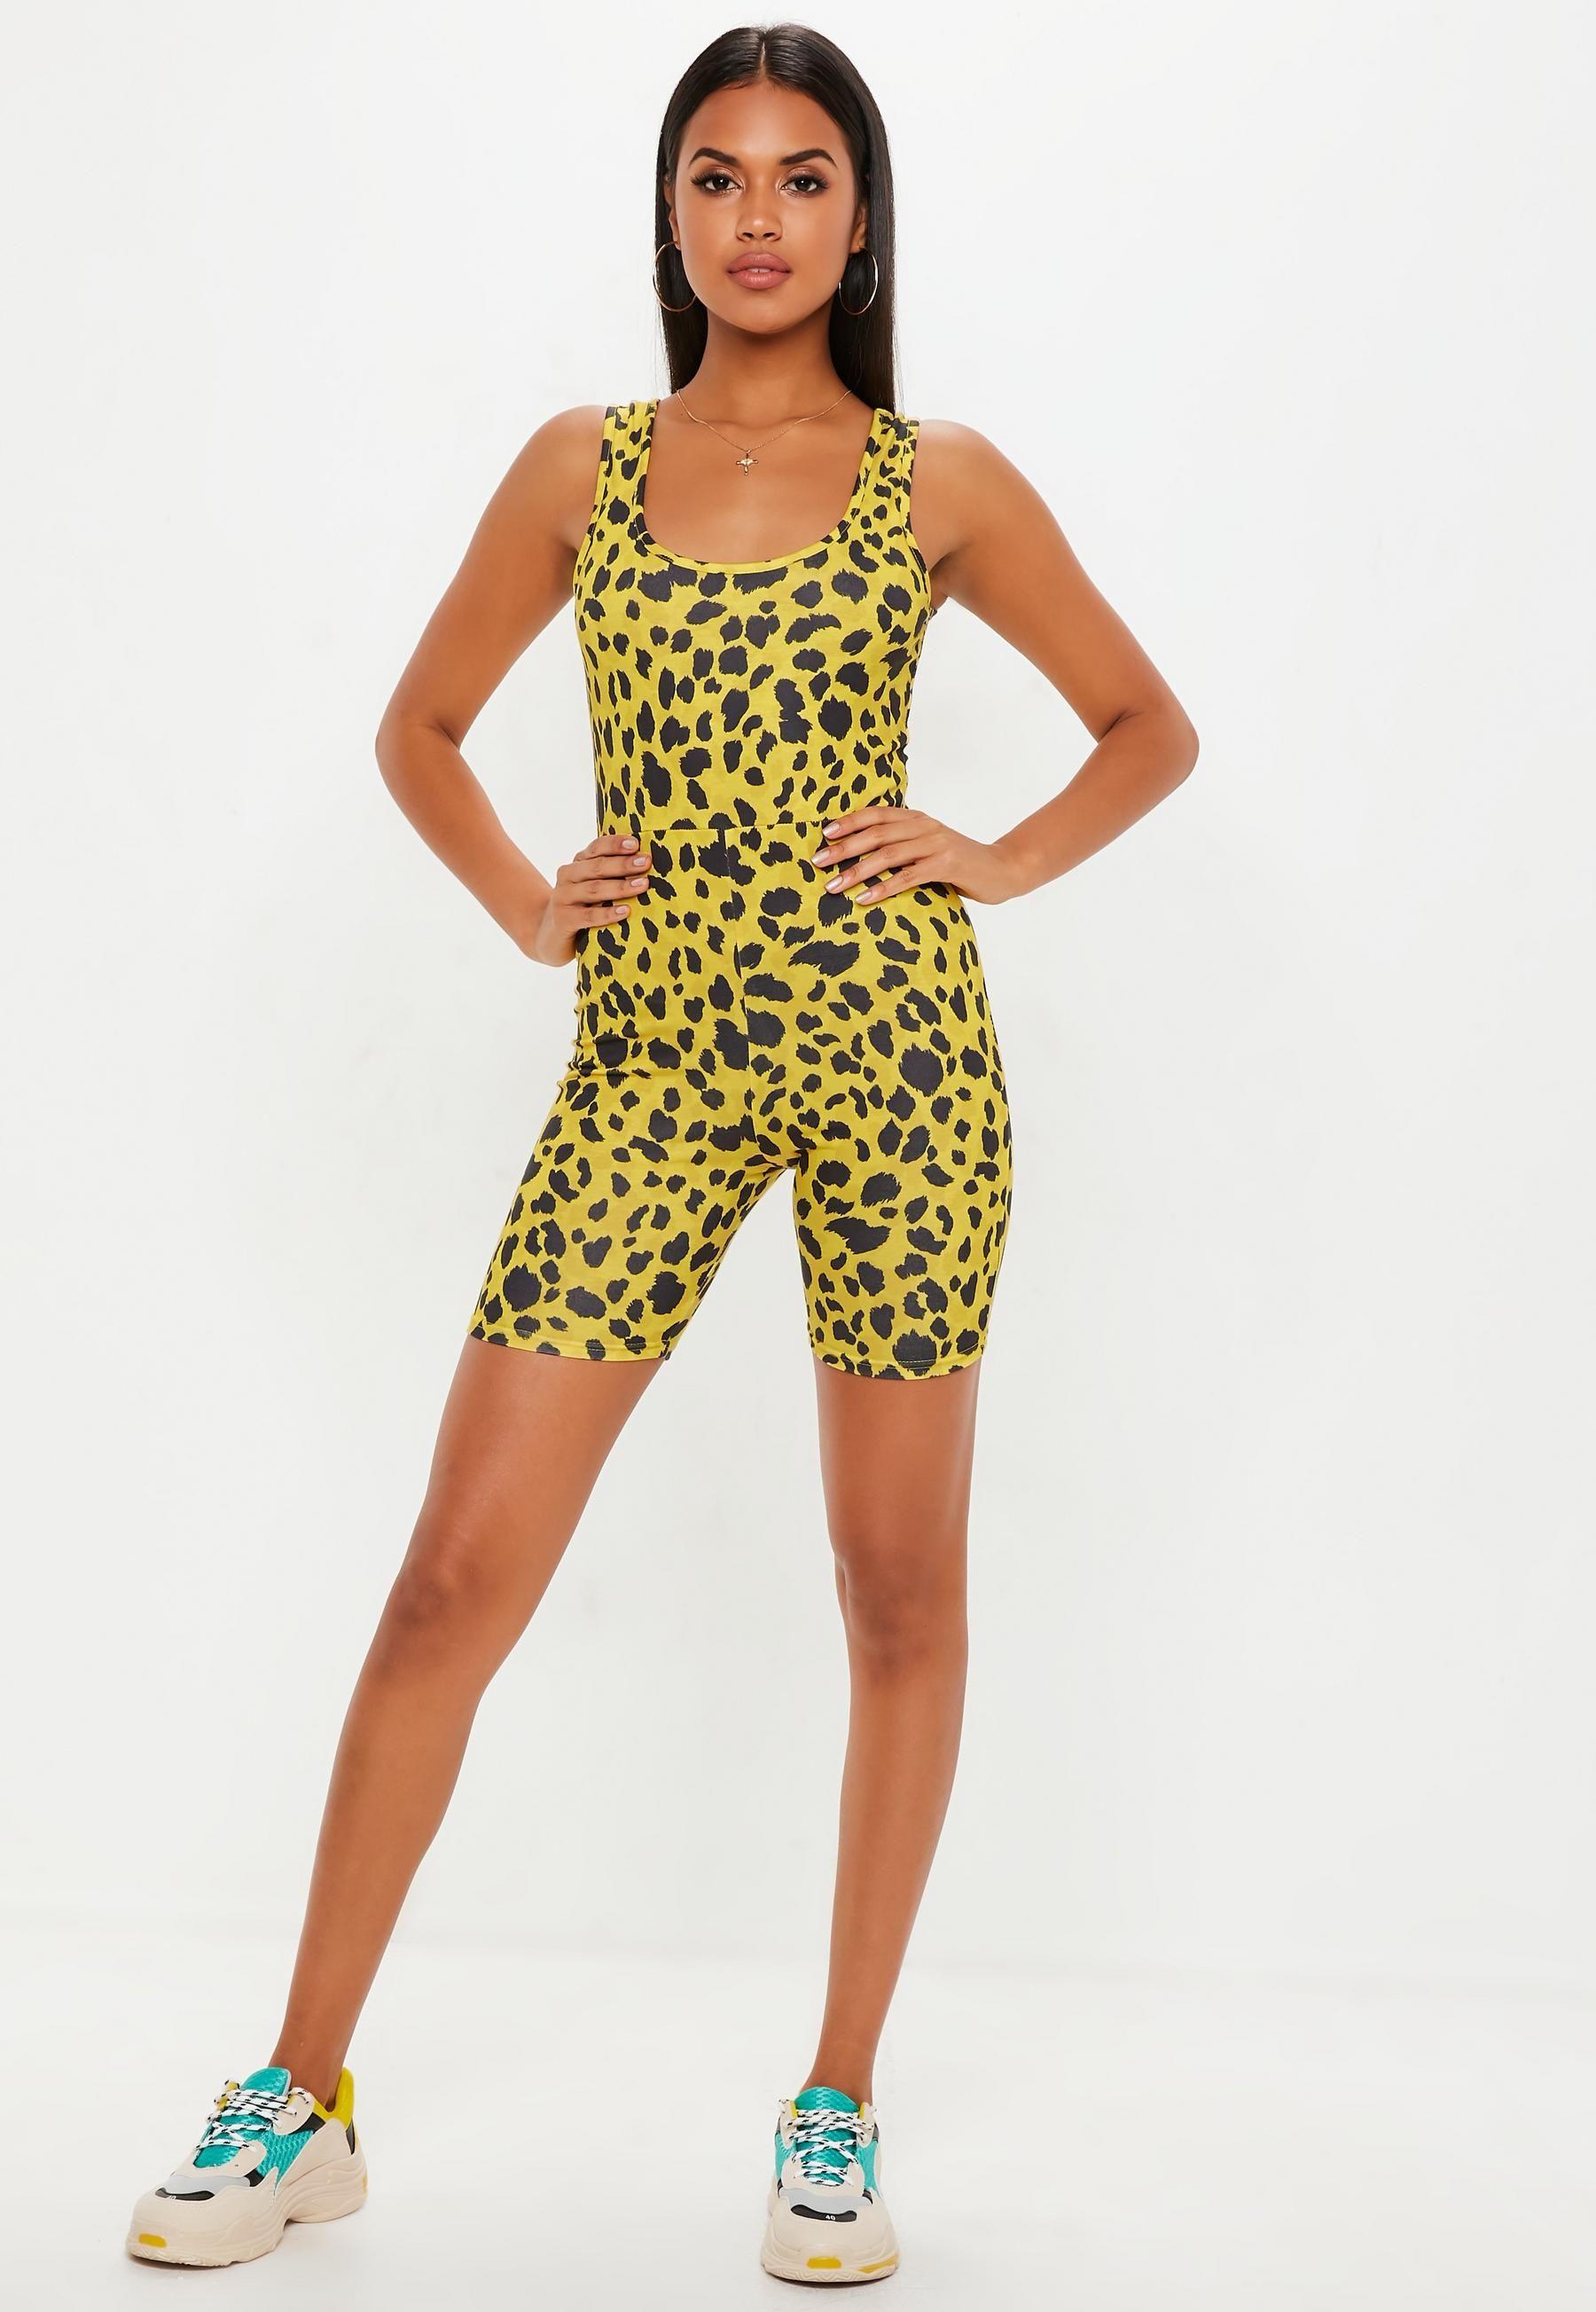 59bbca5494 Yellow Leopard Print Unitard